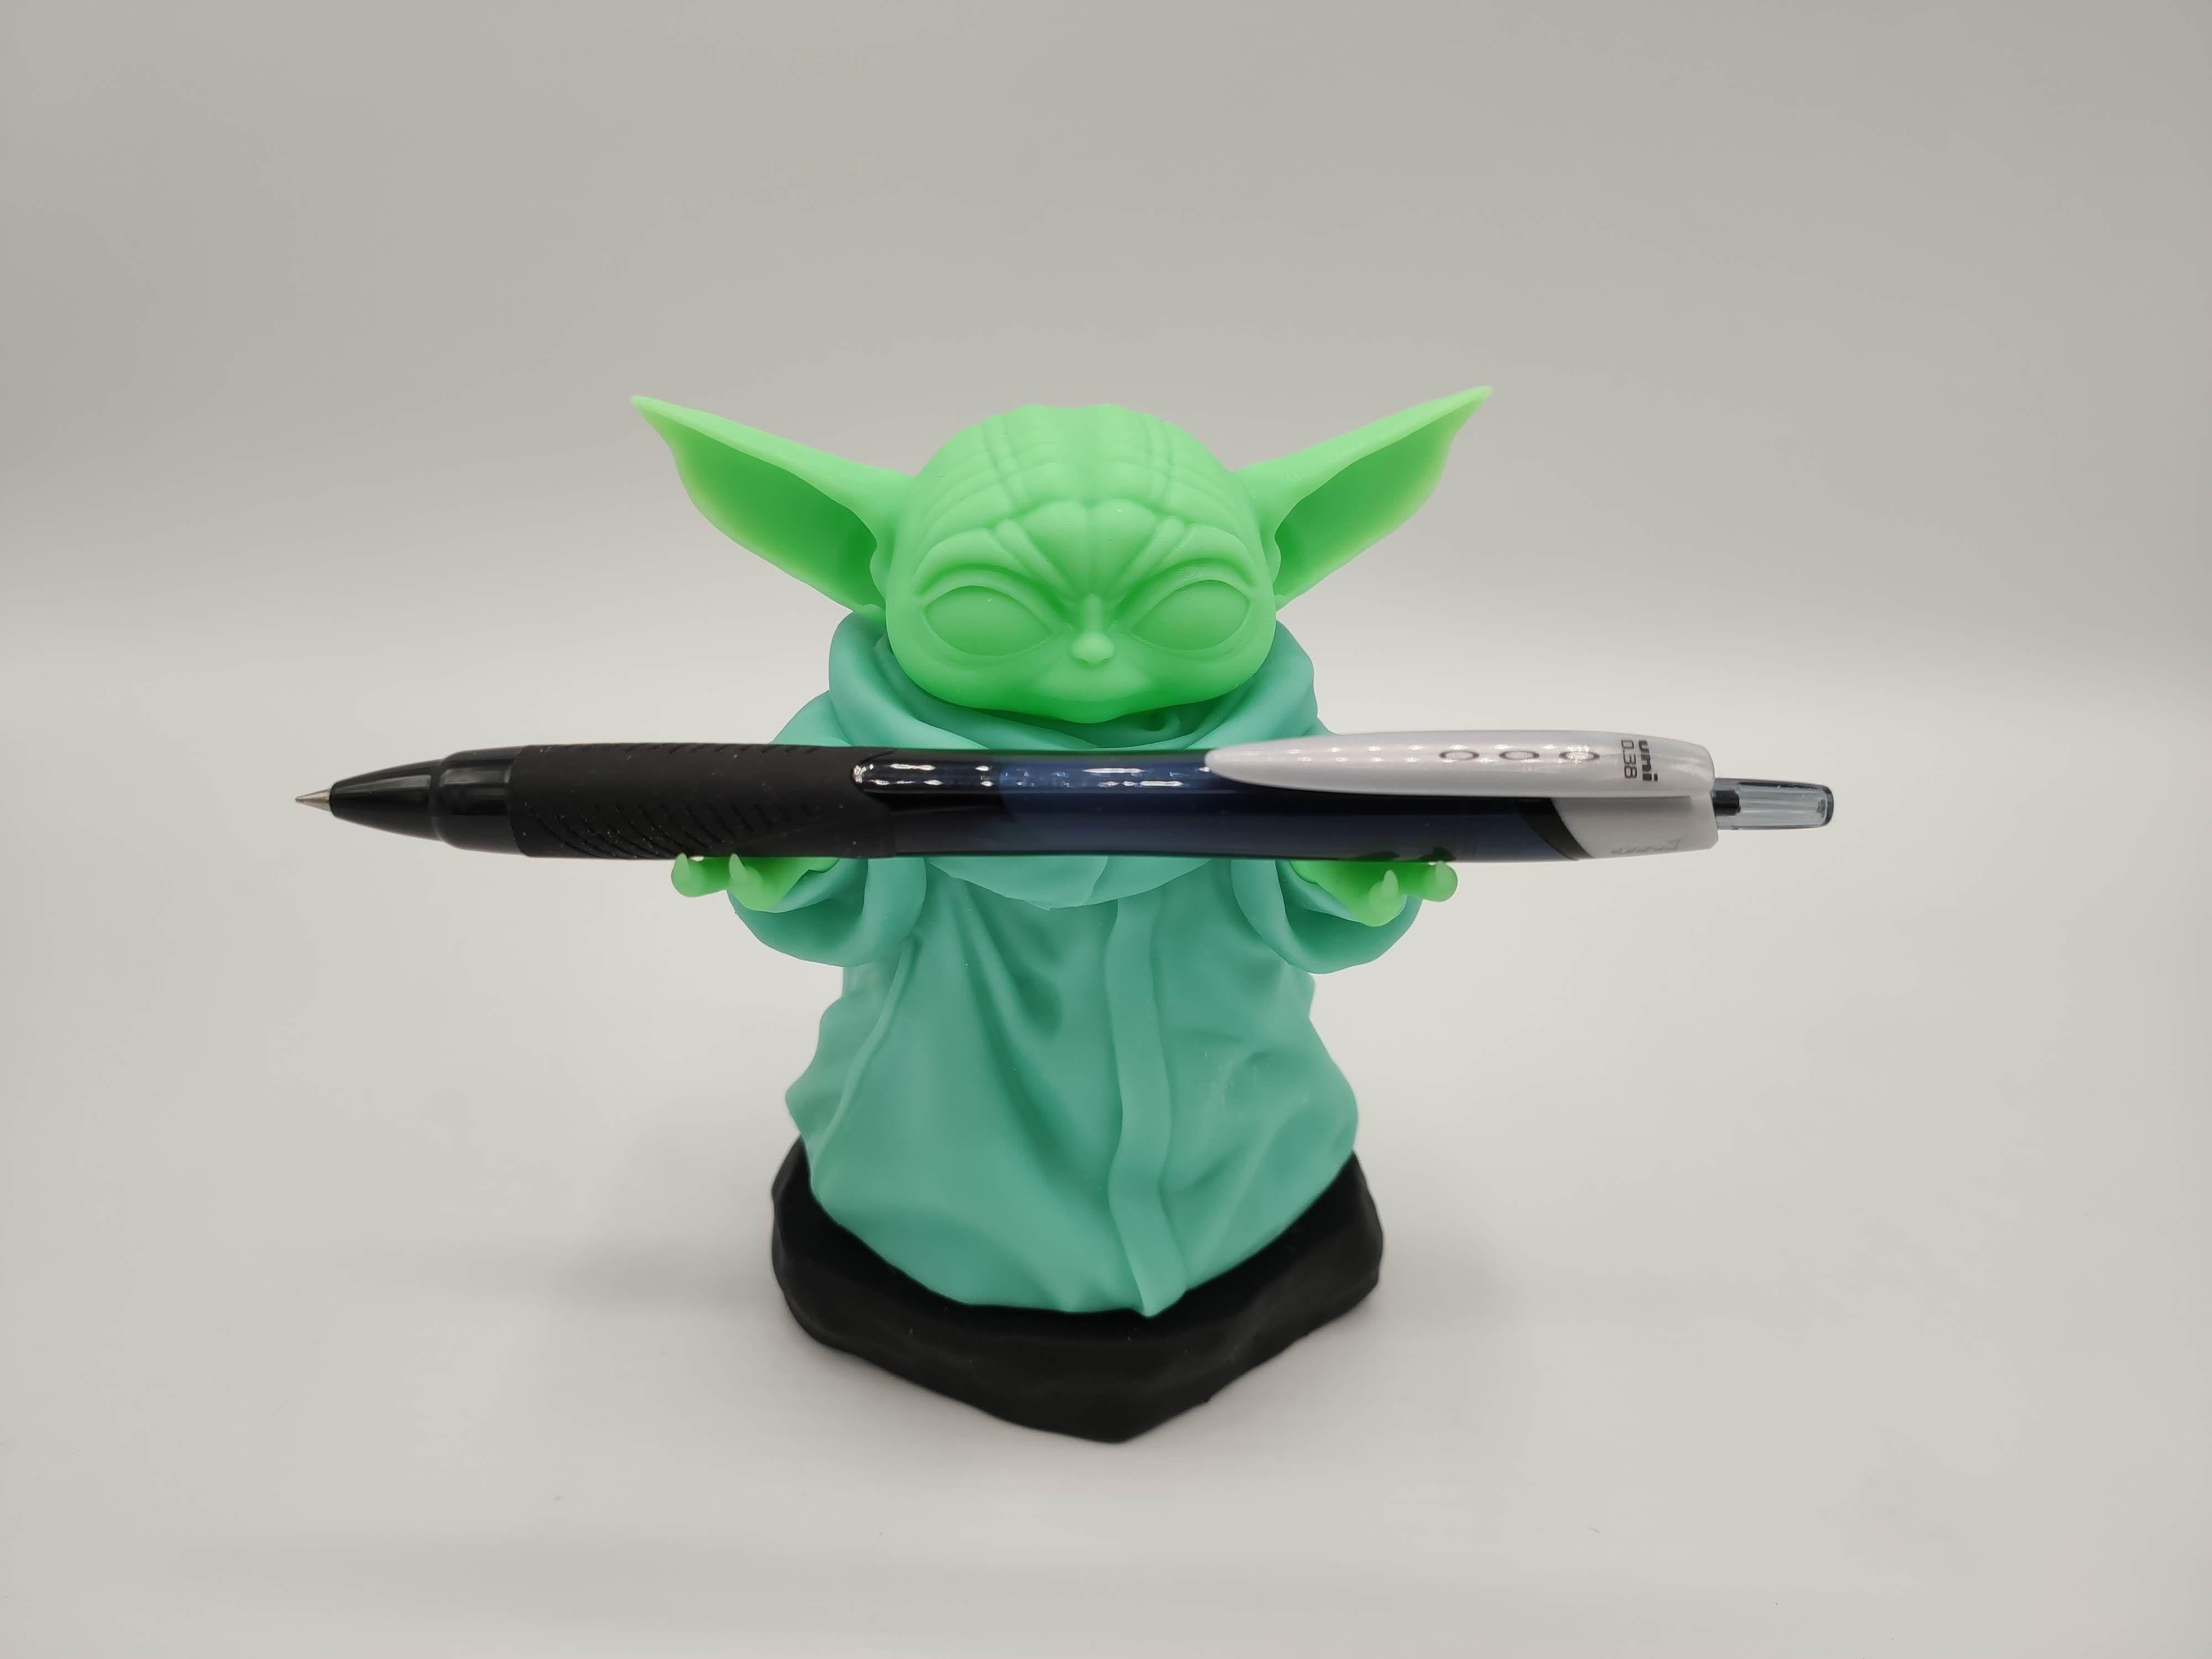 Mandalorian - Baby Yoda - Baby Yoda - the child